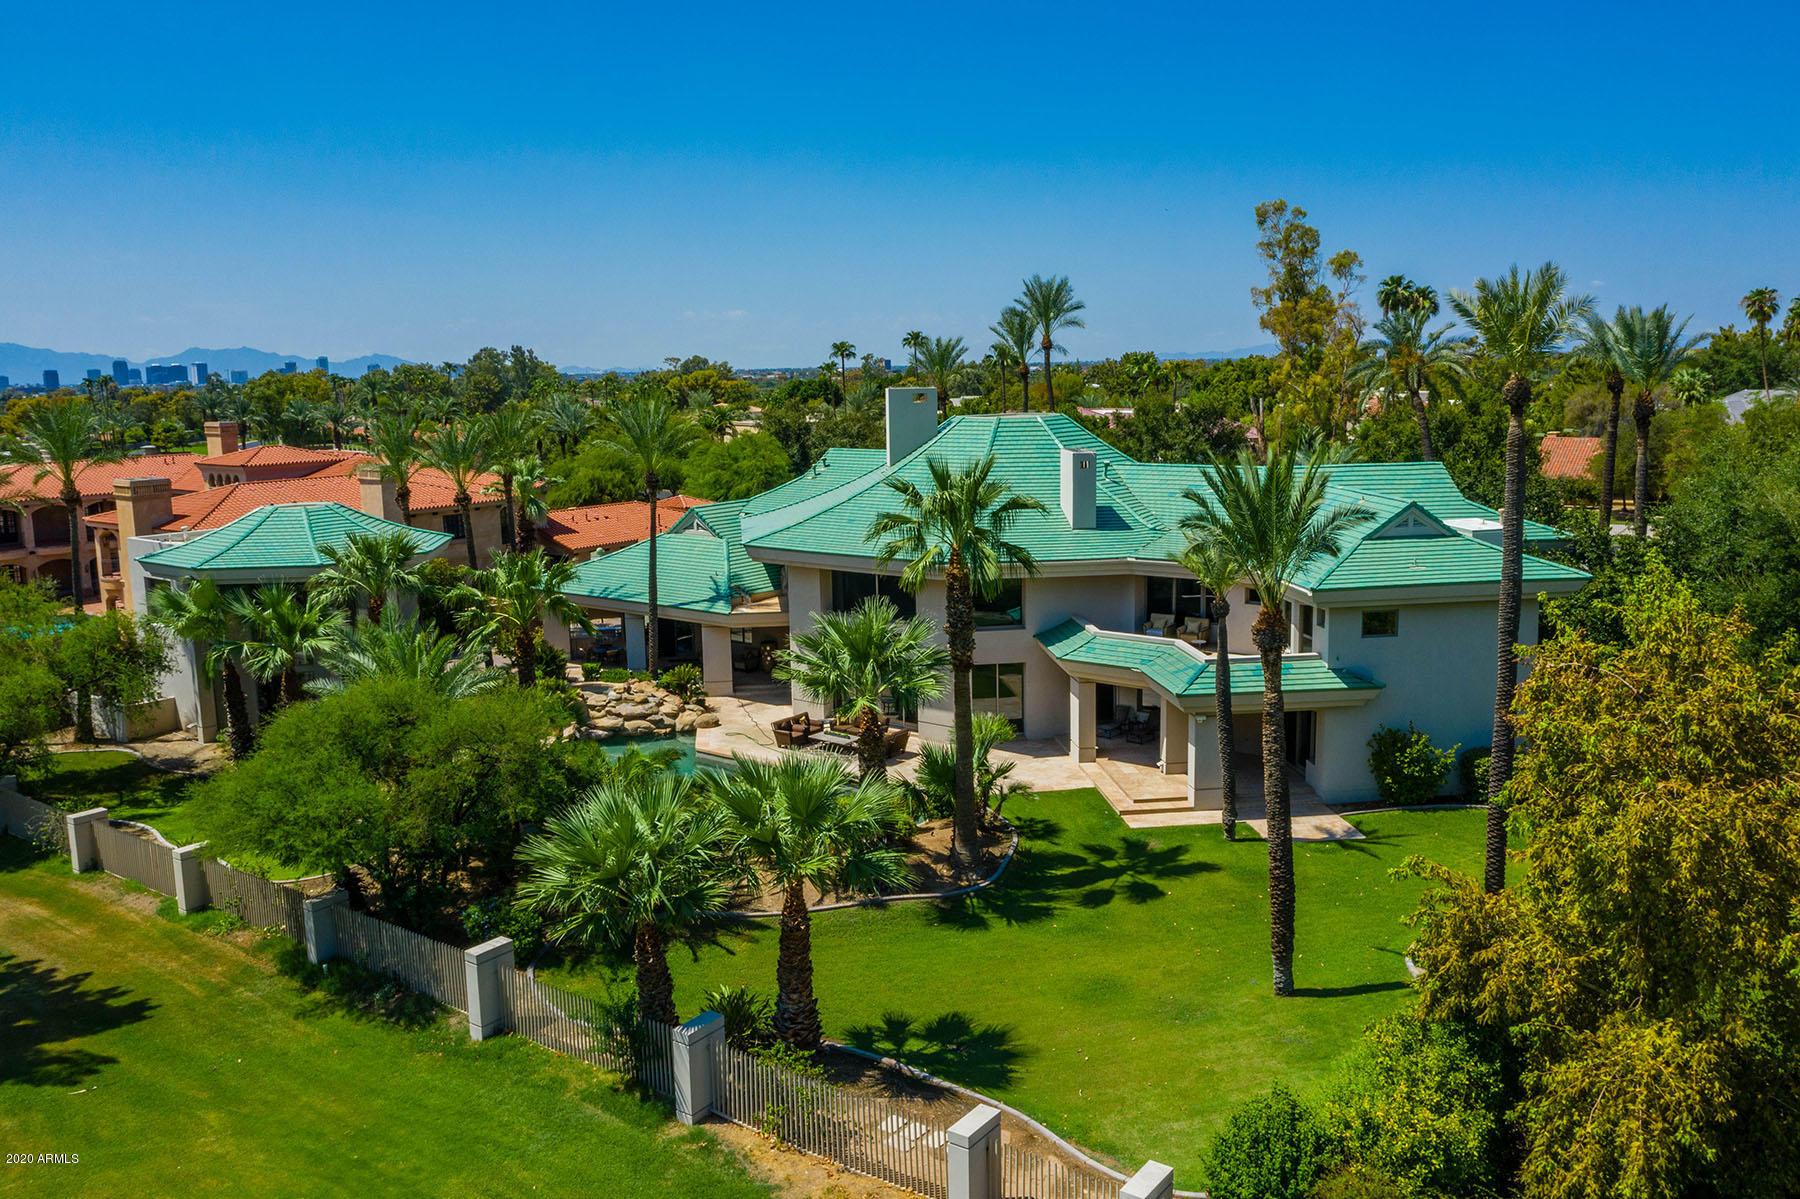 MLS 6118715 42 E BILTMORE Estate, Phoenix, AZ 85016 Phoenix AZ